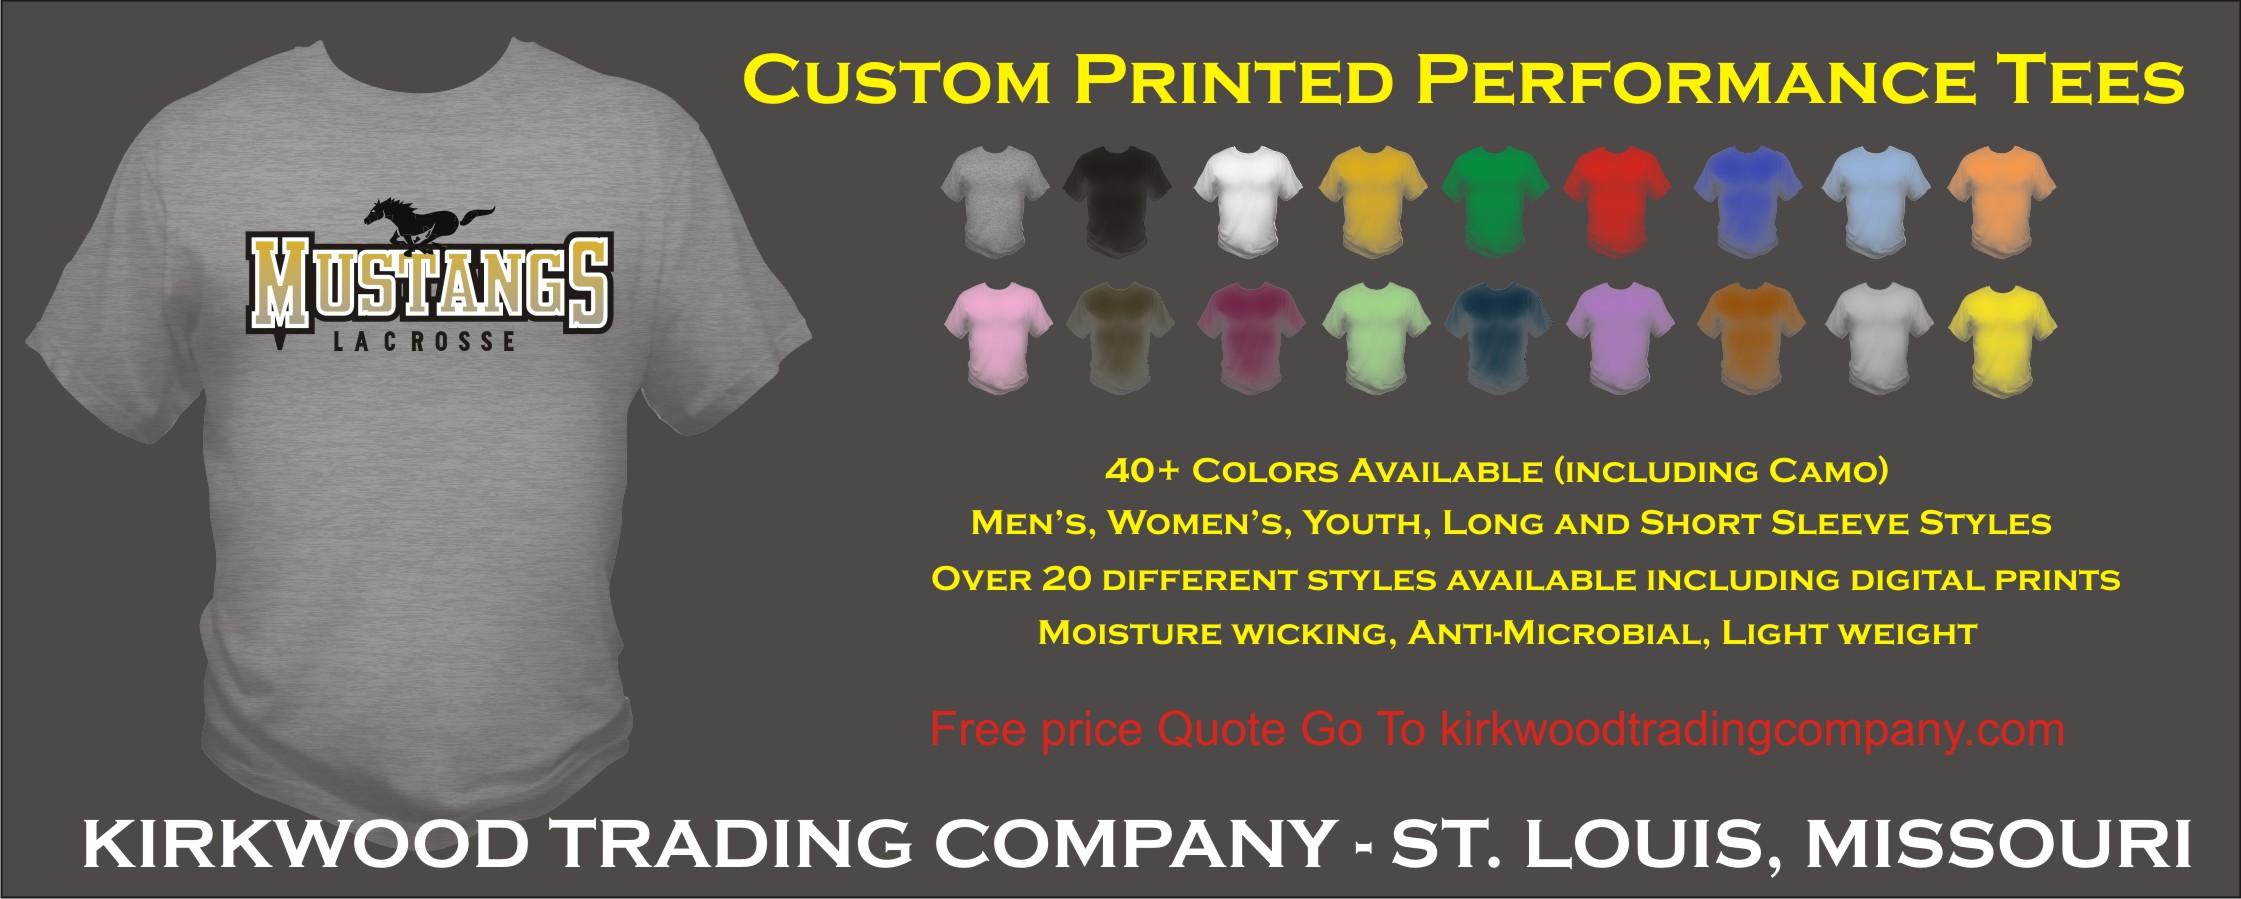 Custom Printed Performance T Shirts Kirkwood Trading